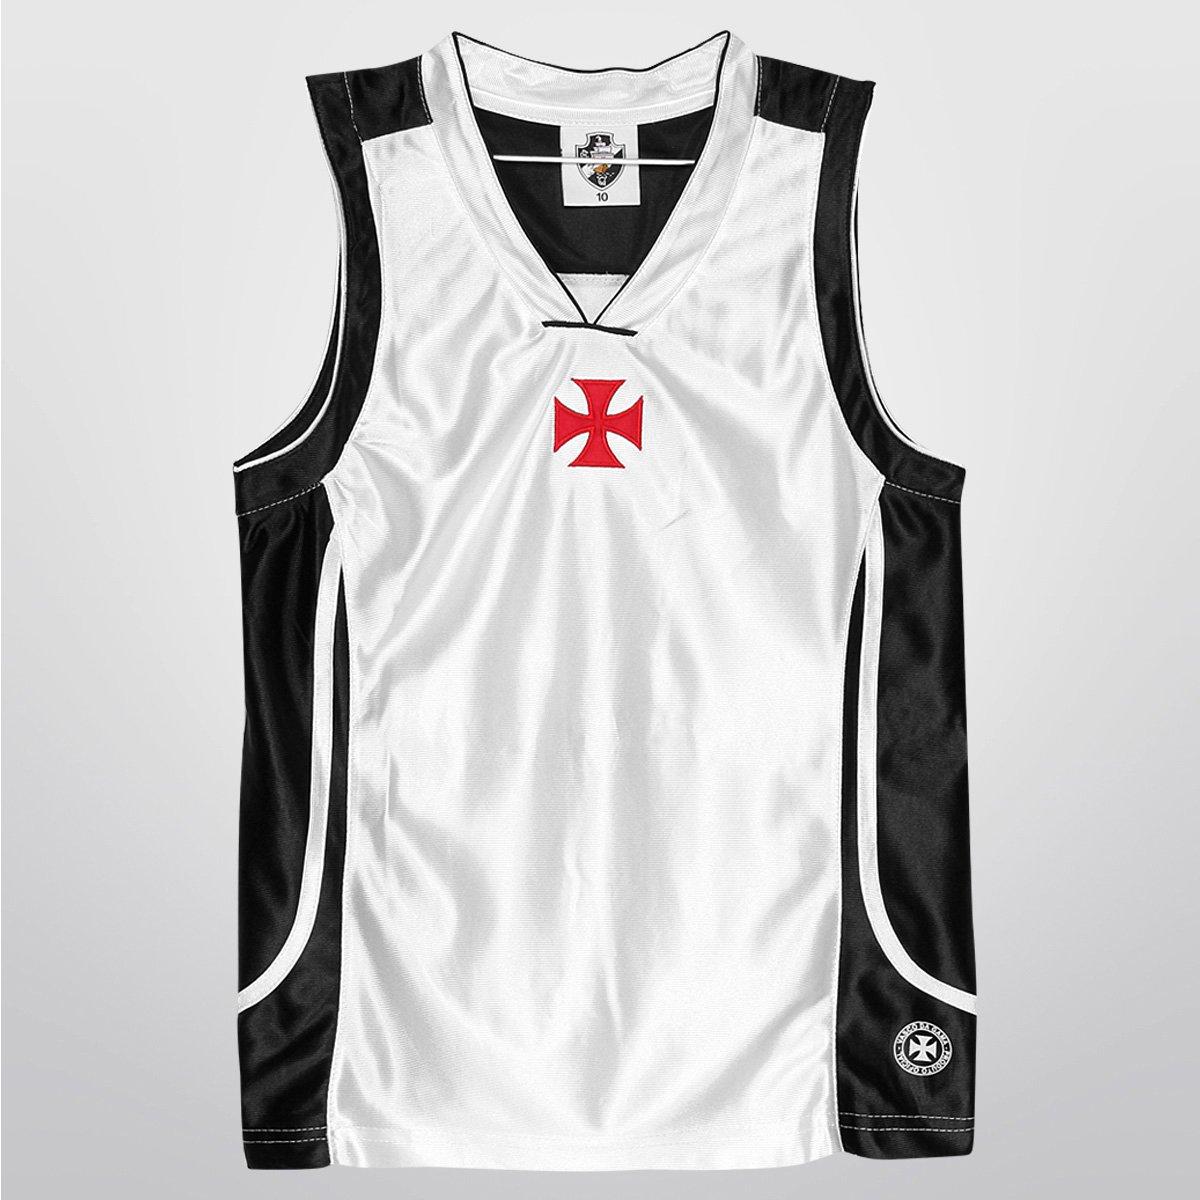 a0a2ad79b5 Camiseta Regata Juvenil Vasco Trilobal Basket - Compre Agora